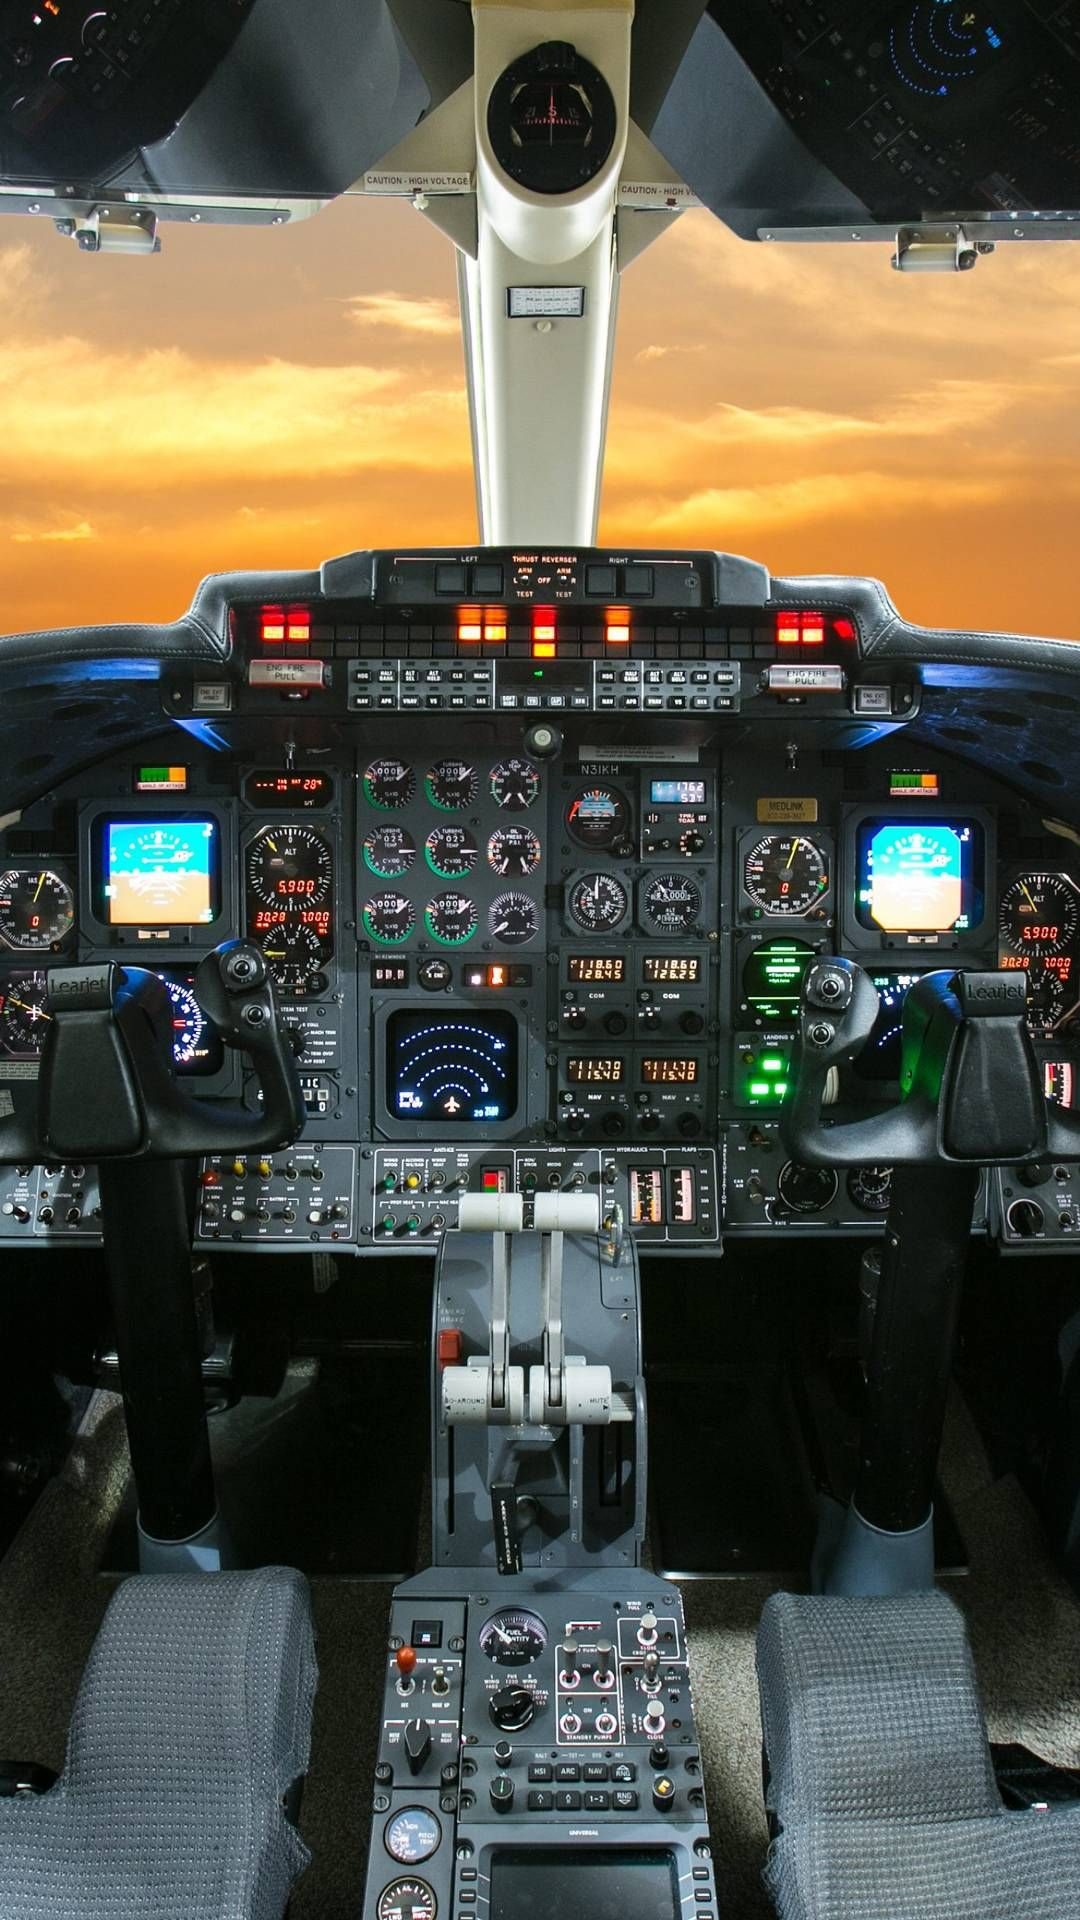 AircraftCockpitiPhoneWallpaper iPhone Wallpapers